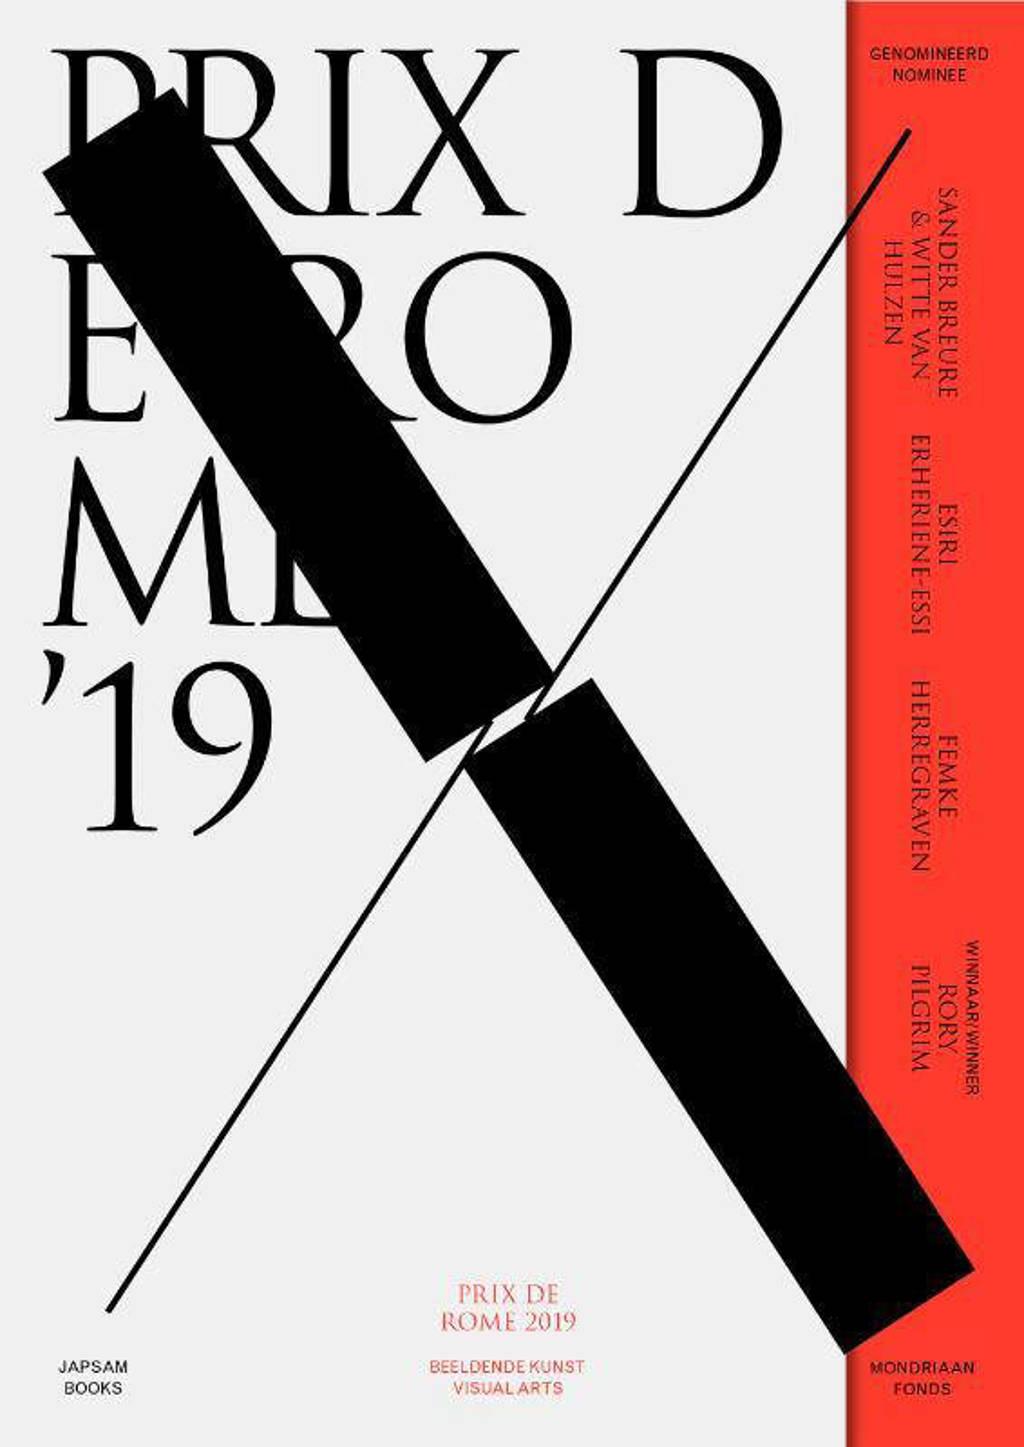 Prix de Rome: Prix de Rome 2019. Beeldende Kunst / Visual Arts